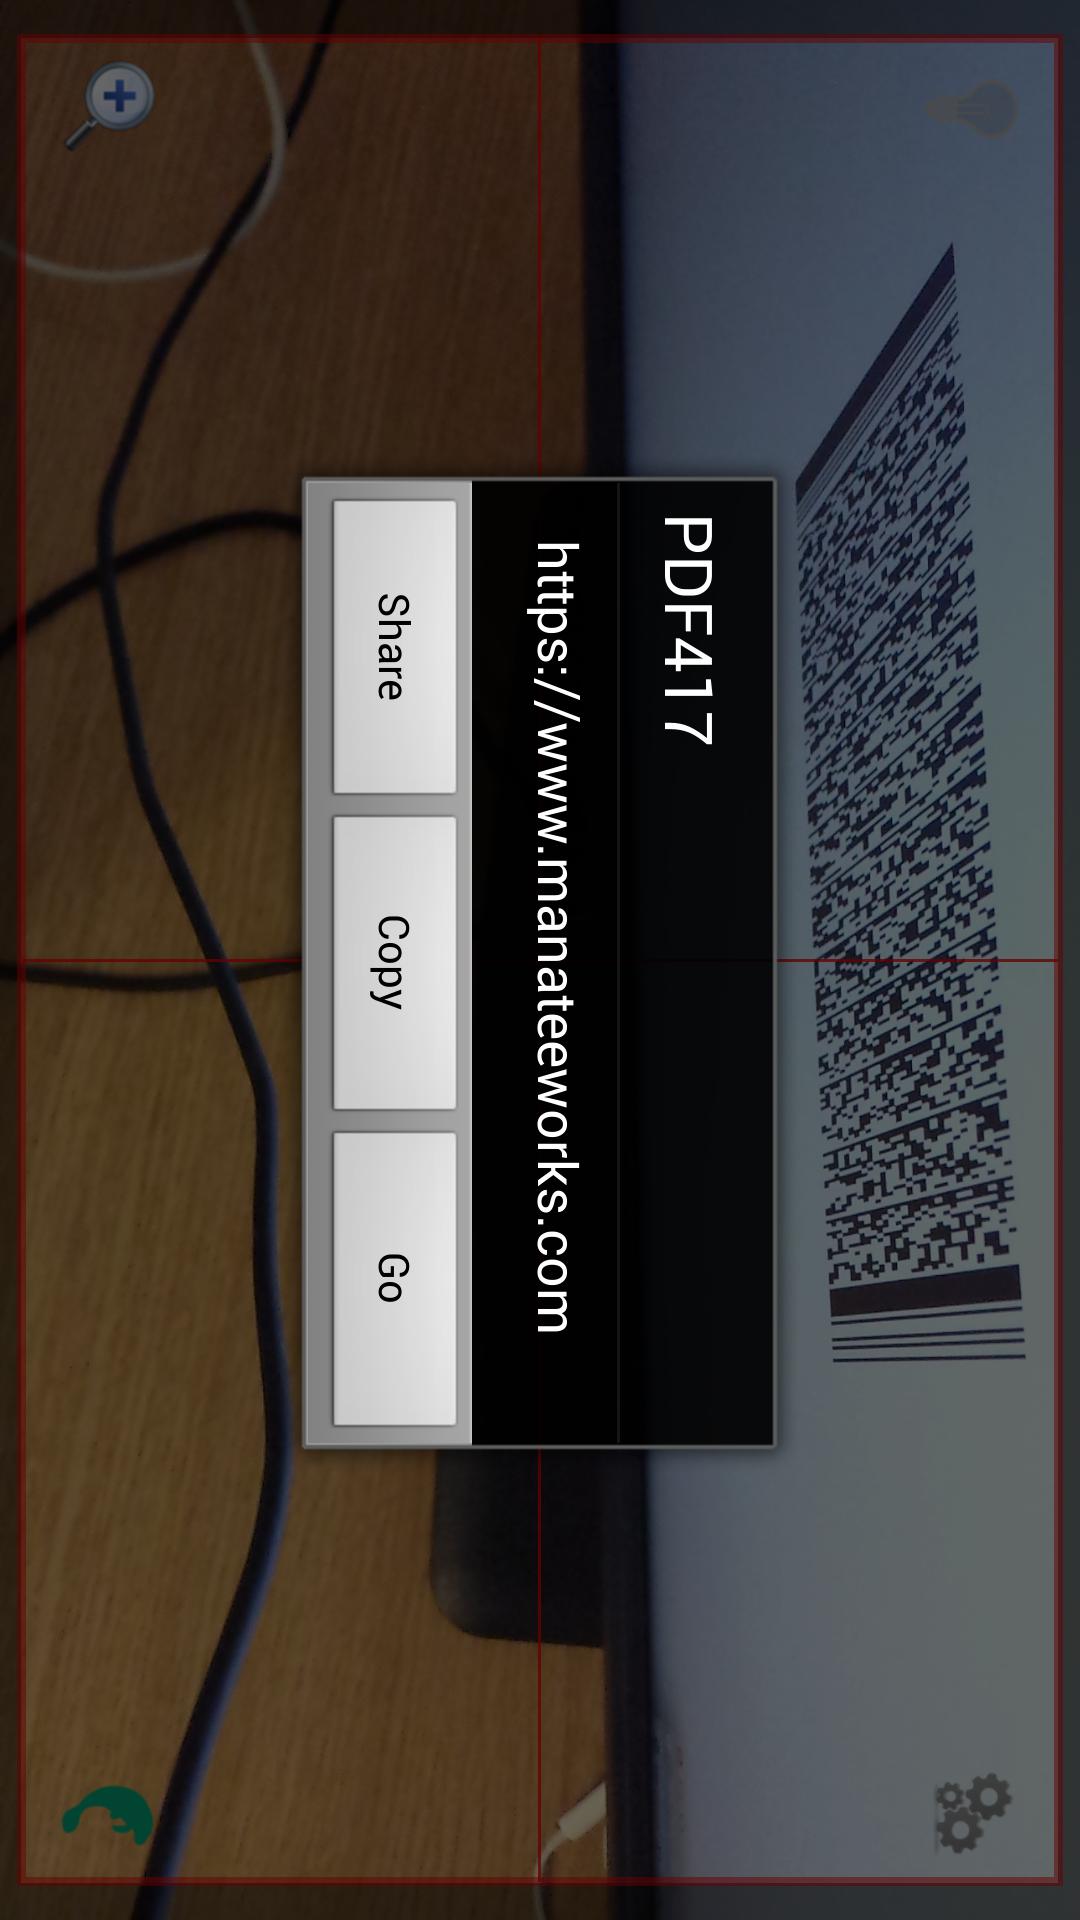 Manateeworks-barcodescanner - Ionic Marketplace